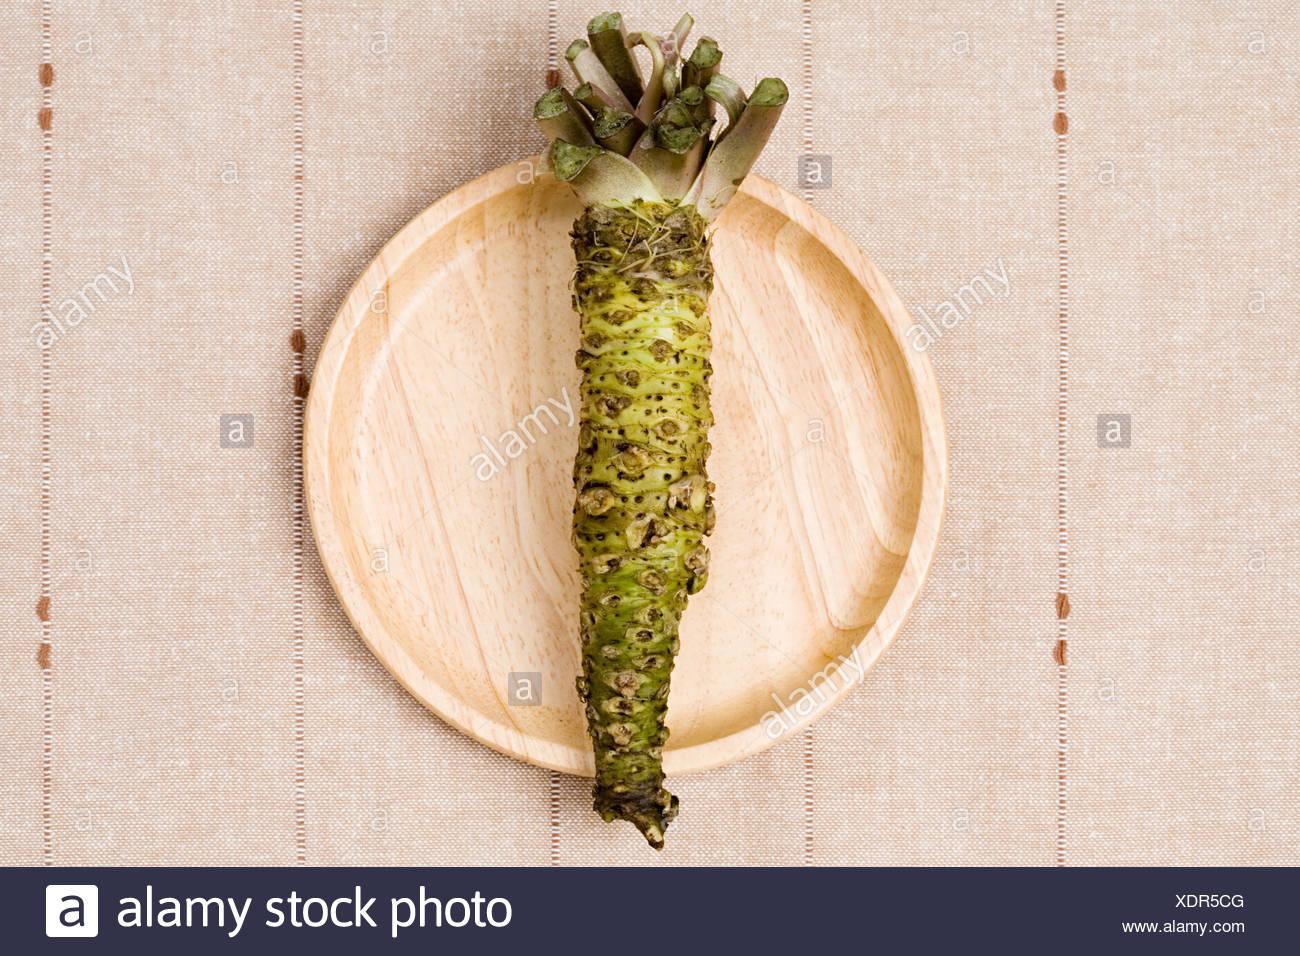 Wasabi plant - Stock Image